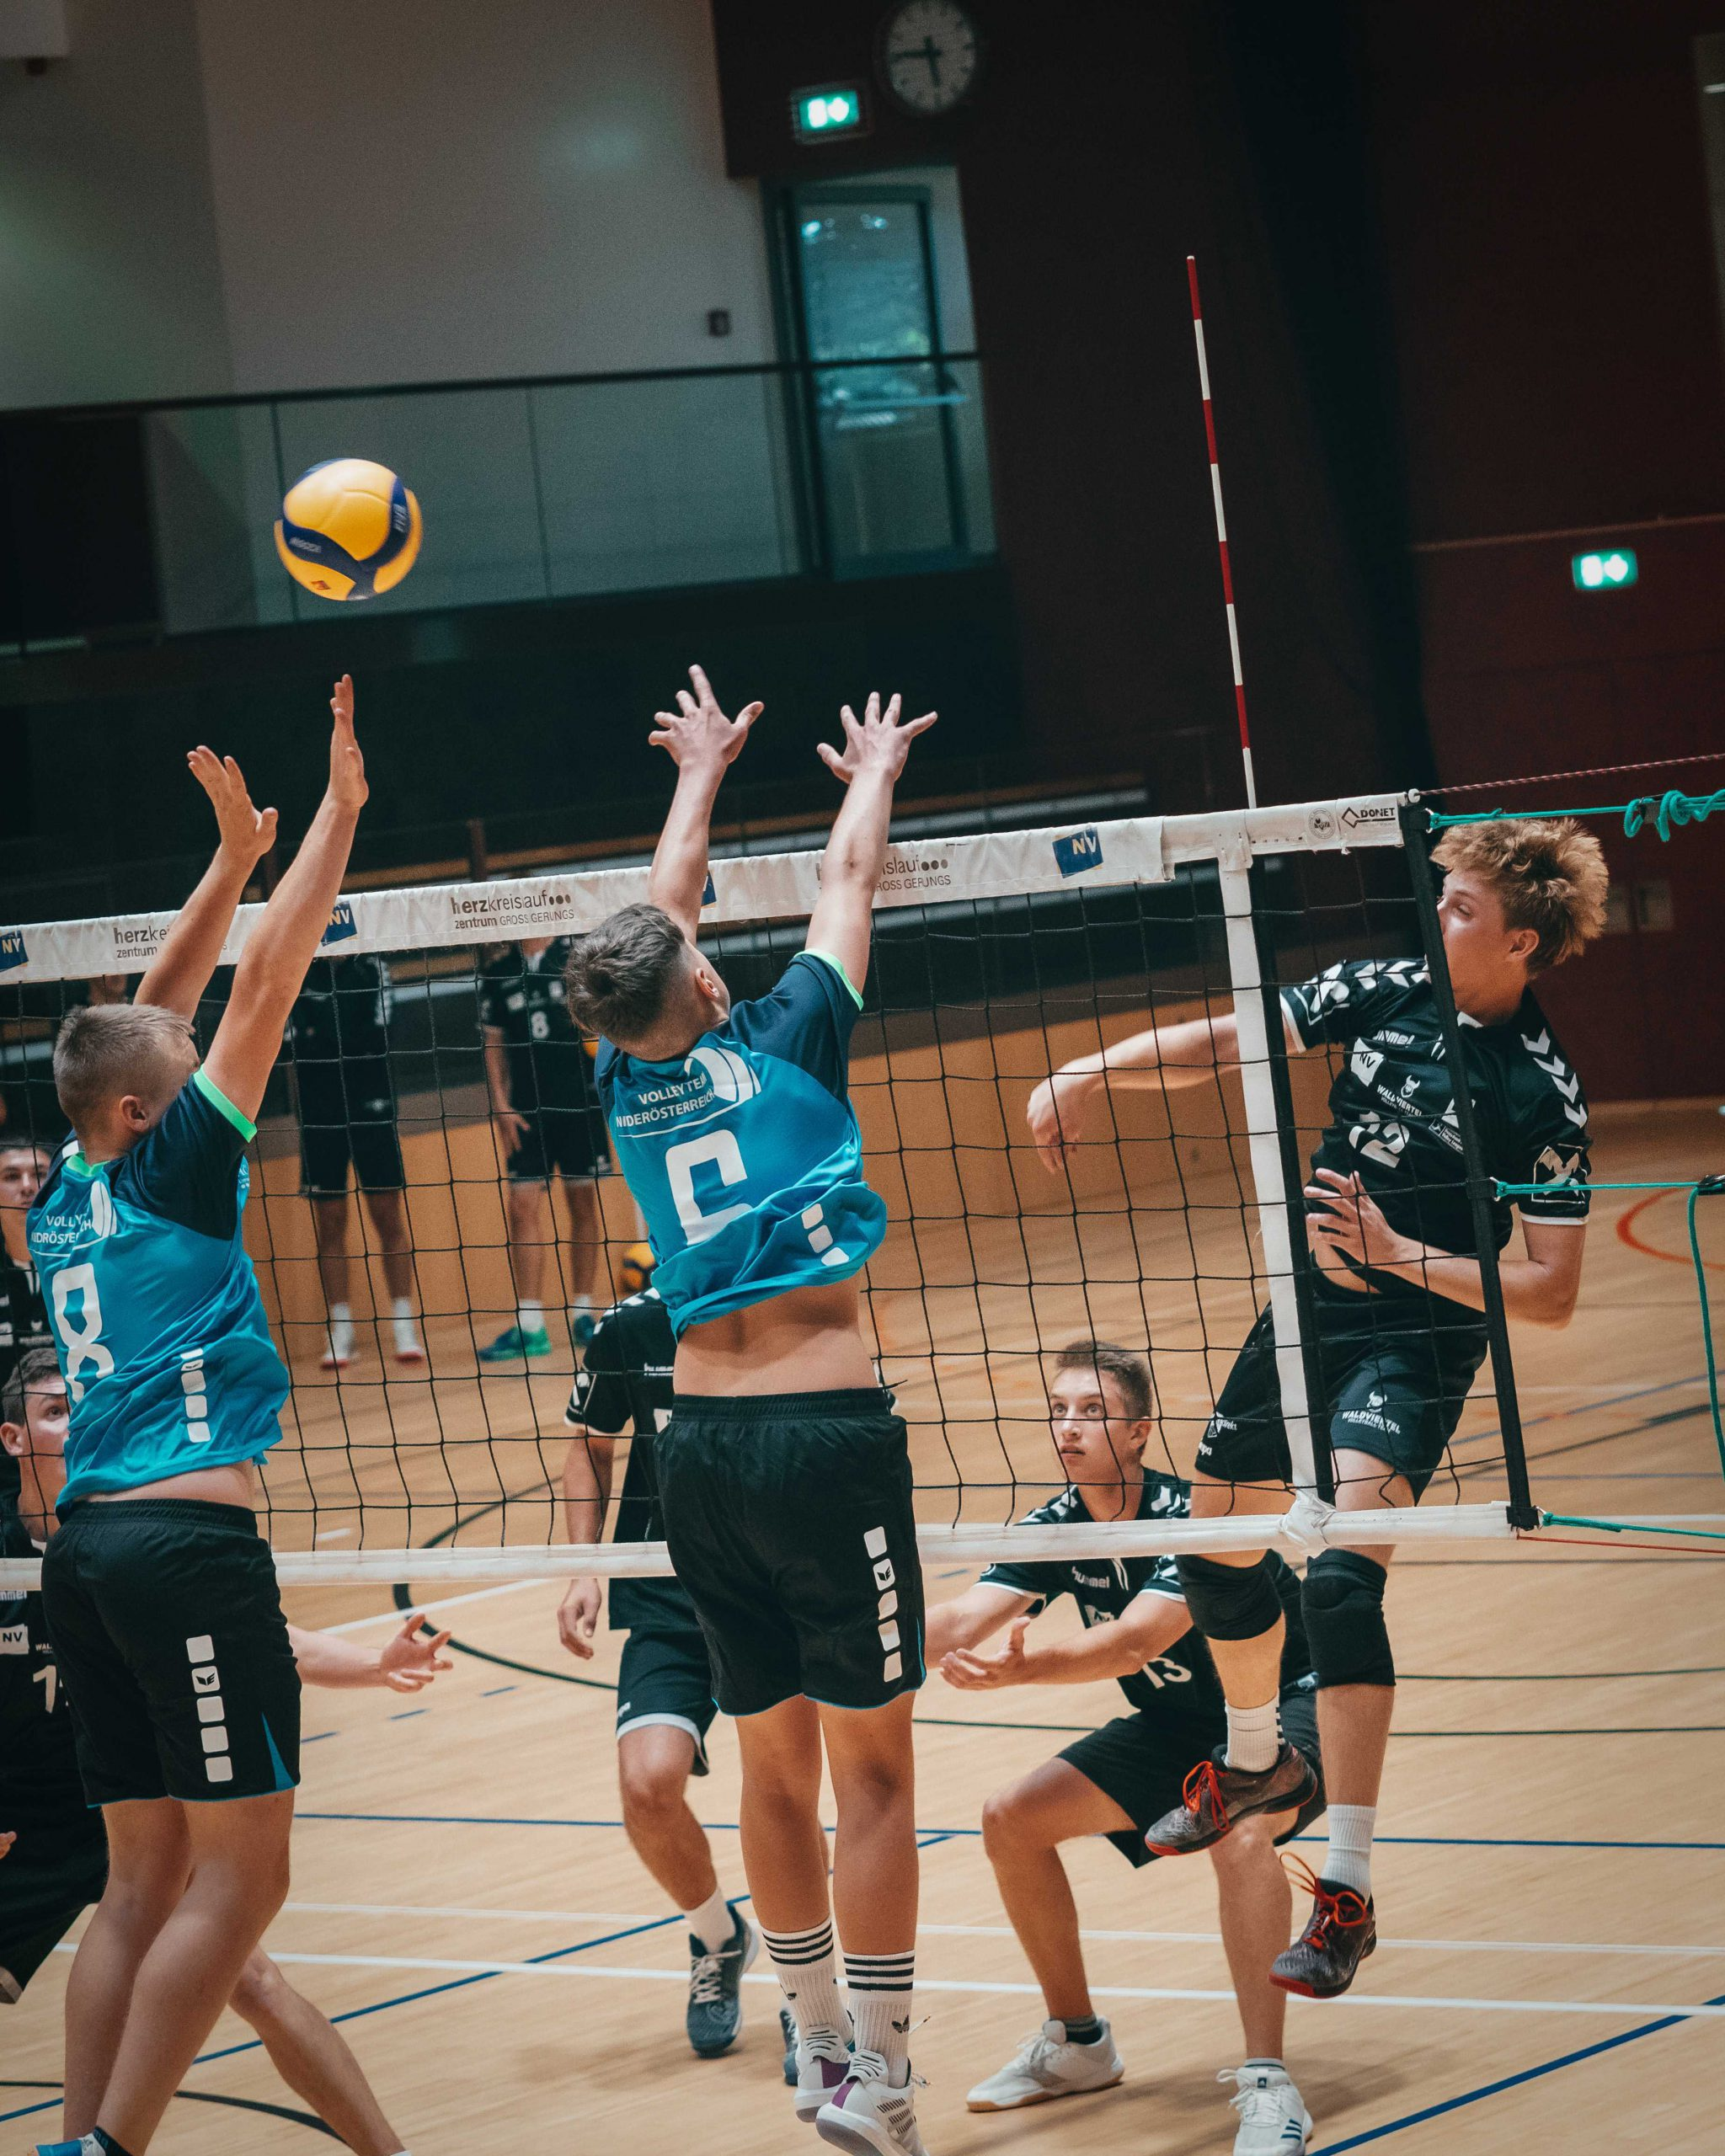 Landesliga gegen Landeskader